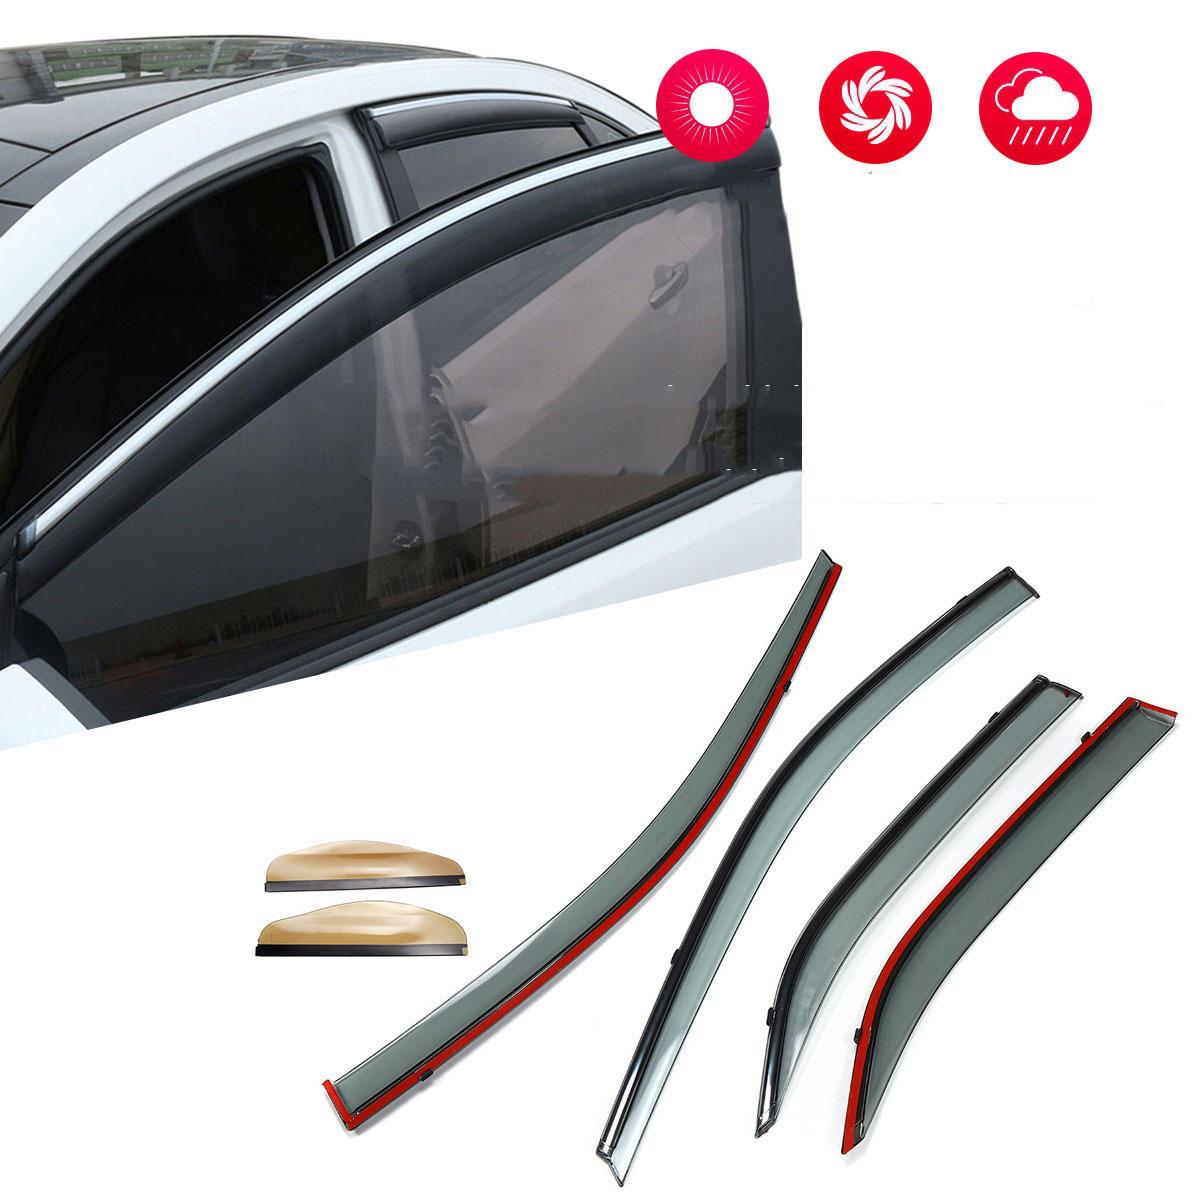 Visor de la ventana Guardia contra la lluvia Vent Sun Shade Deflectores de viento para Toyota Camry 2012-2016